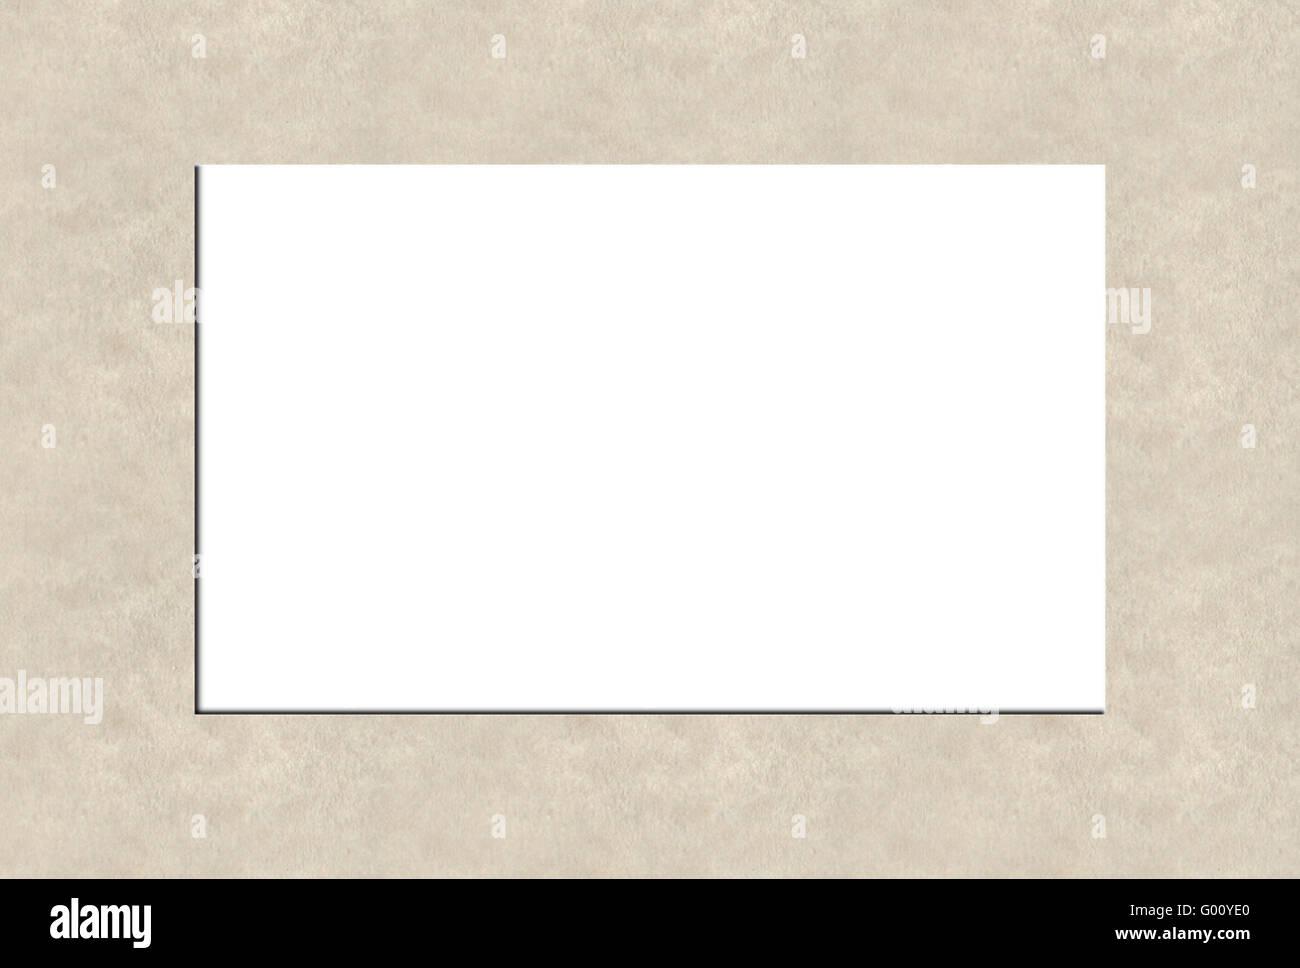 Frame - Stock Image